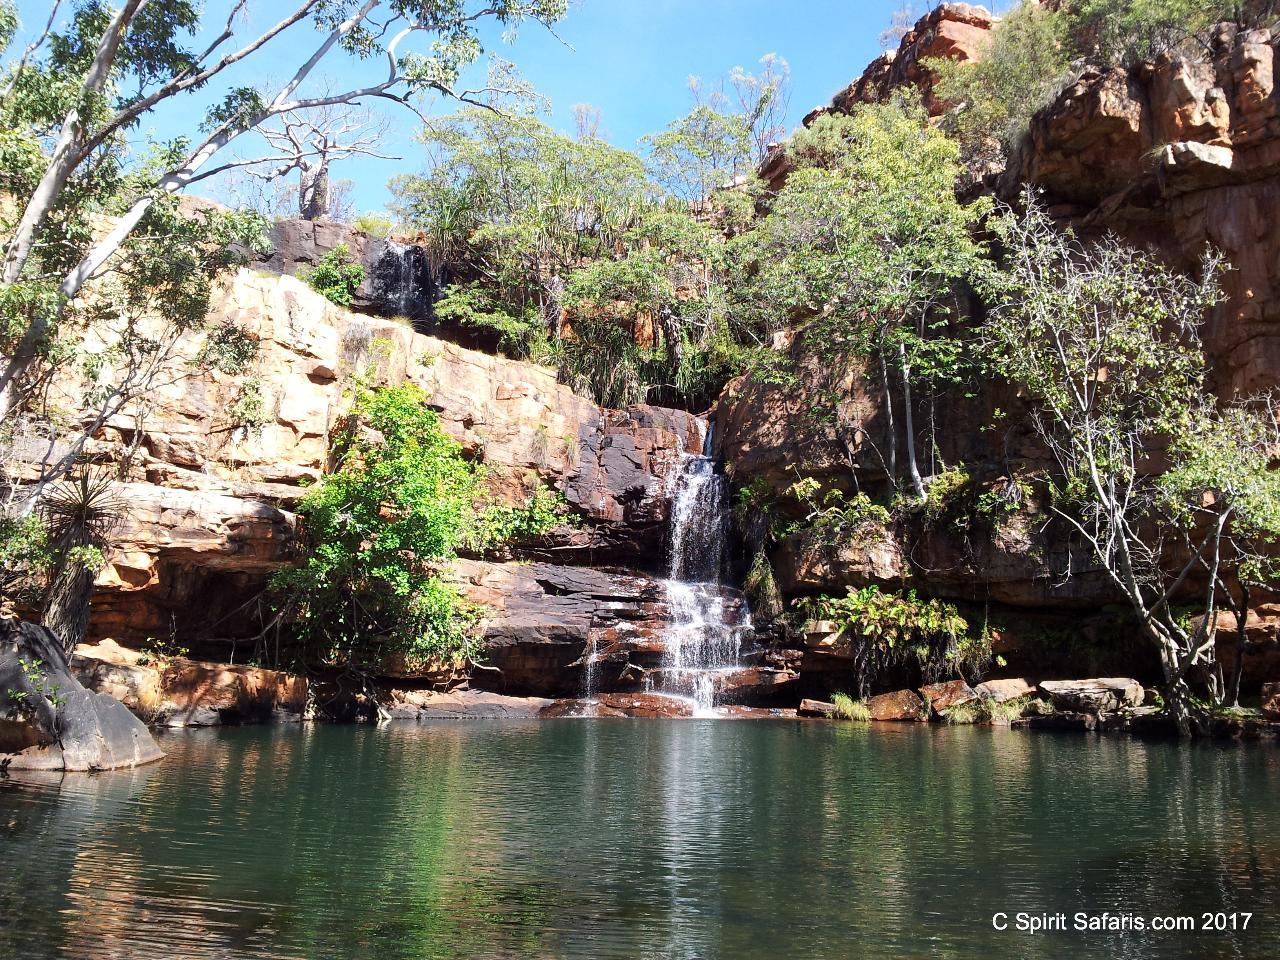 Kimberley Broome to Darwin via Gibb River Rd Manning Gorge Bungle Bungles 8 days